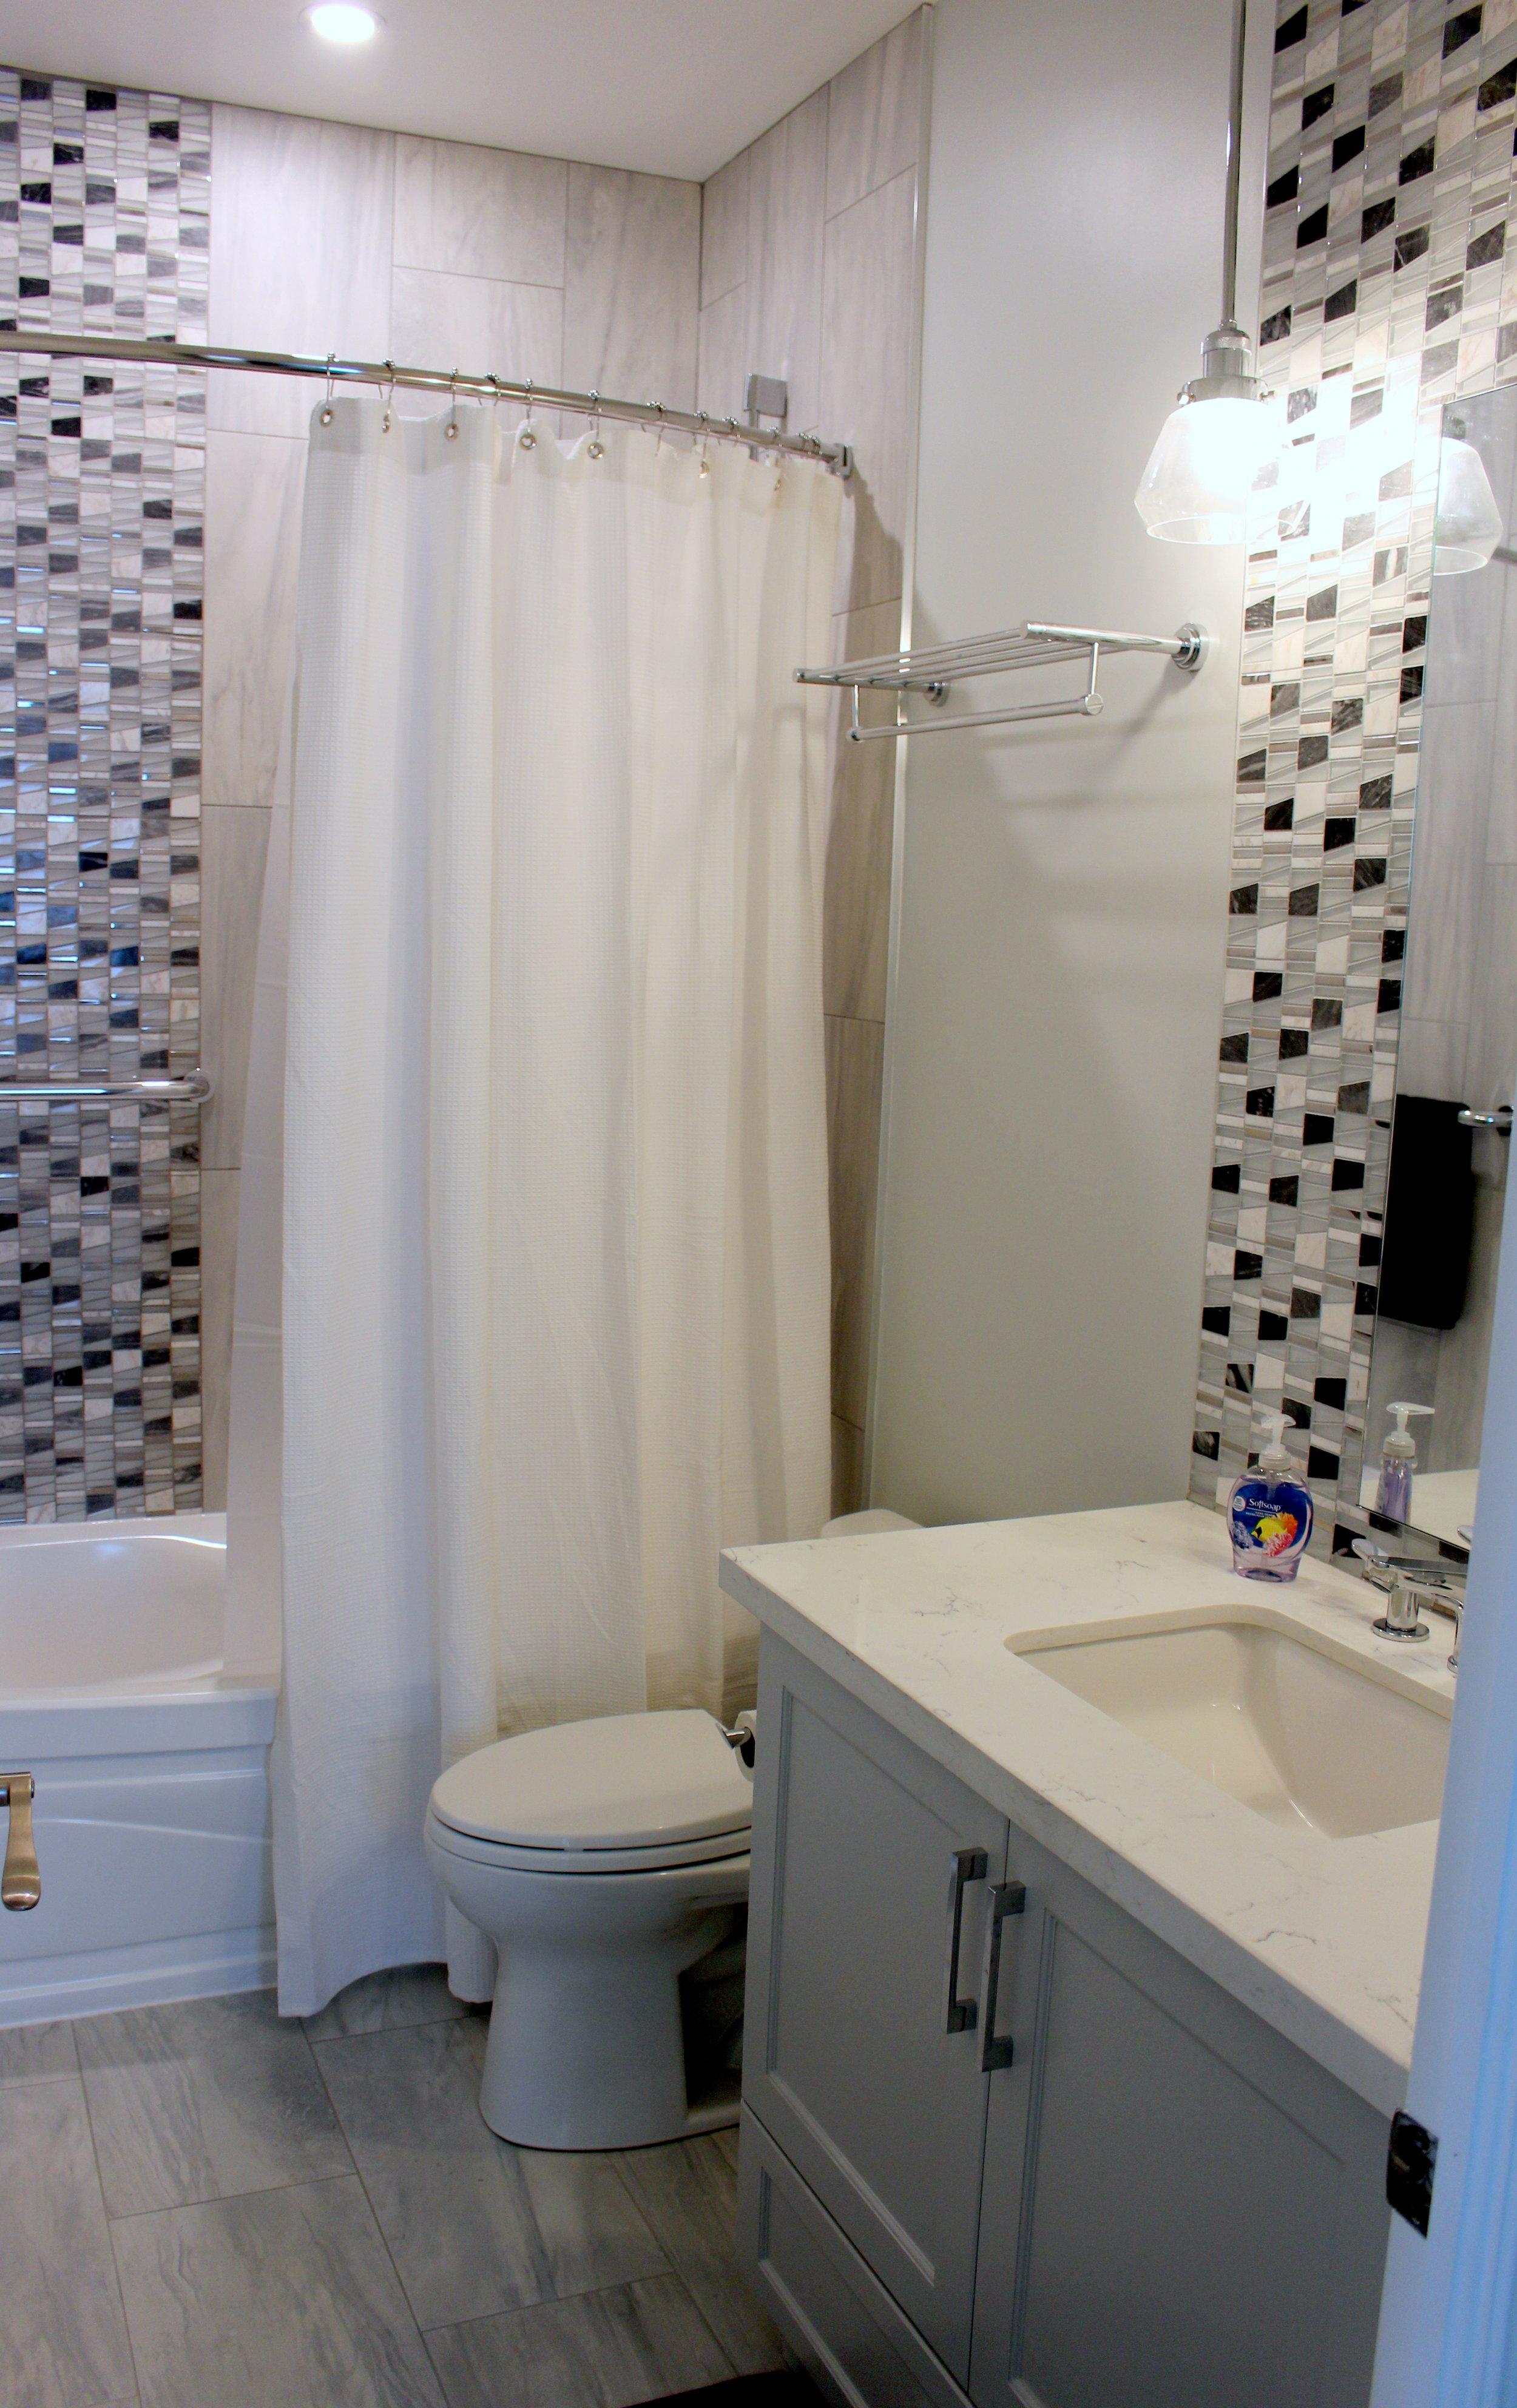 penthouse guest bath 2.JPG